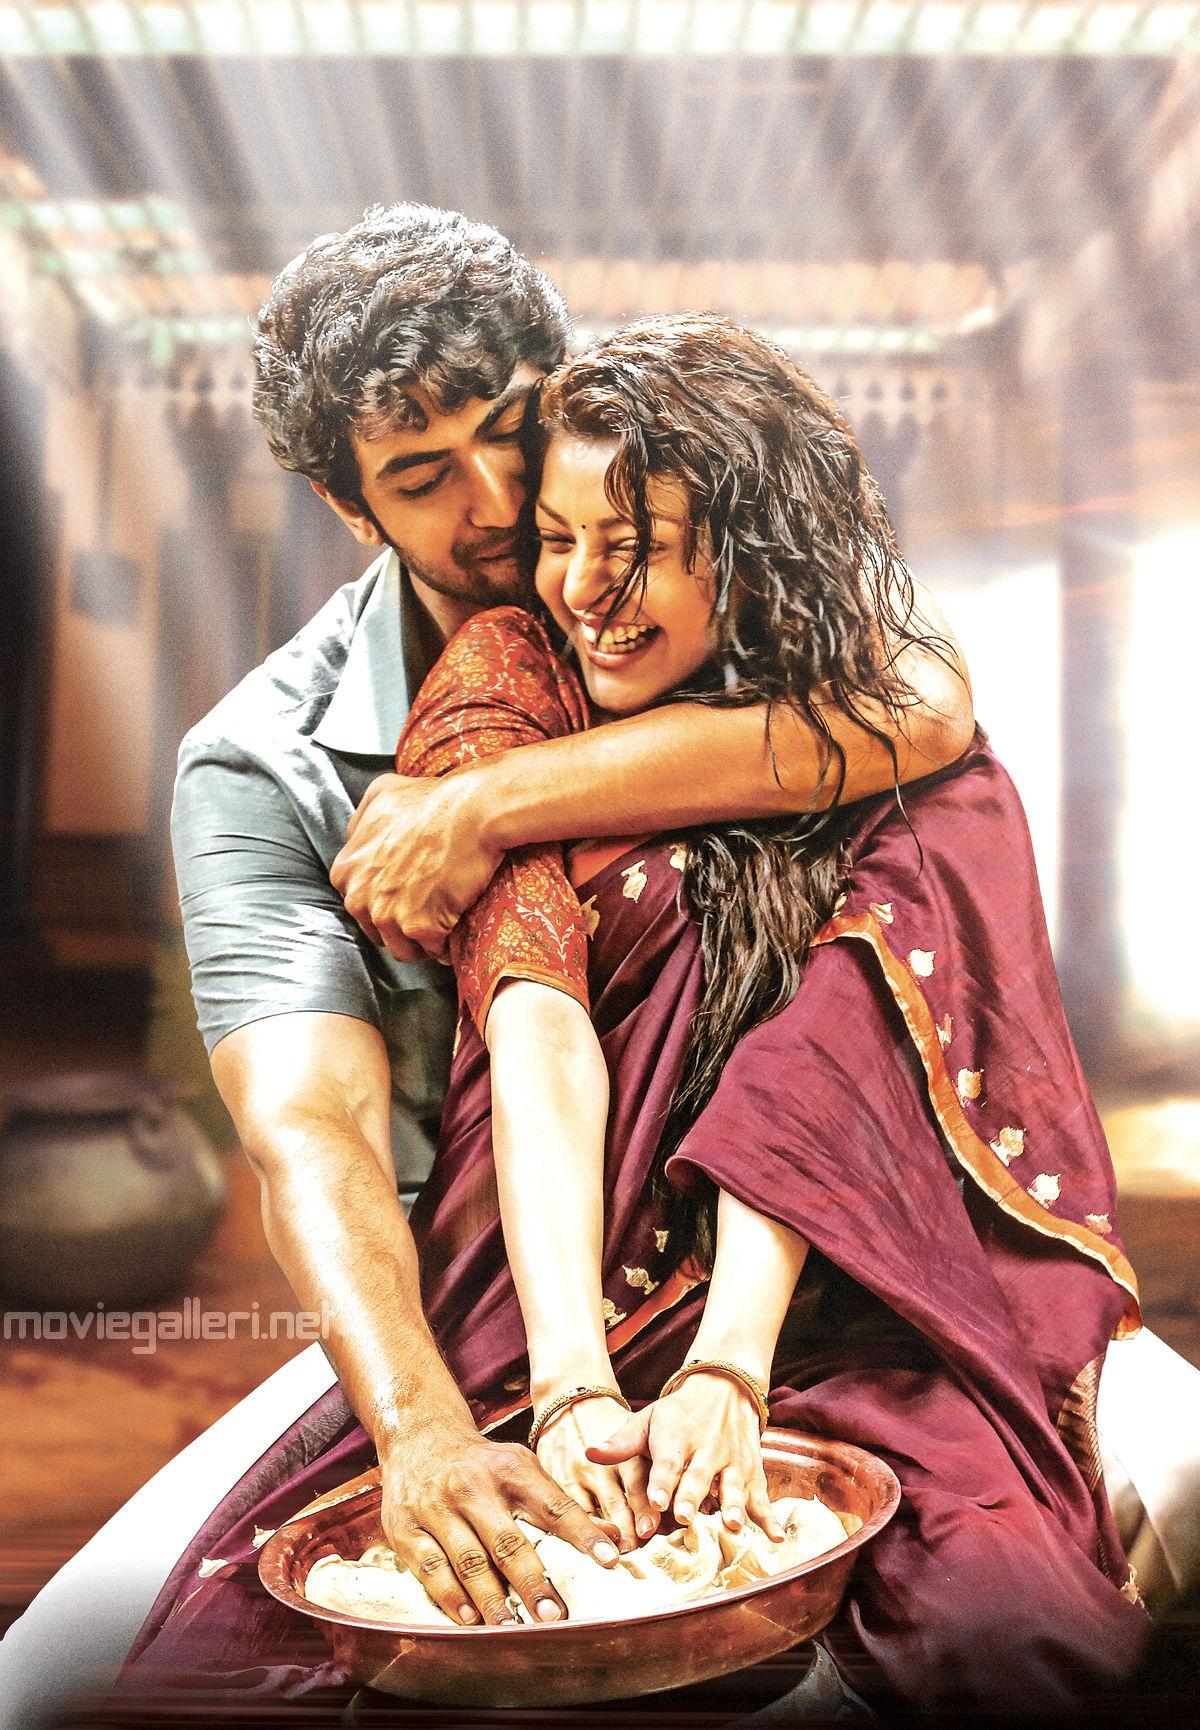 Rana Daggubati & Kajal Agarwal in Nene Raju Nene Mantri Movie New Still